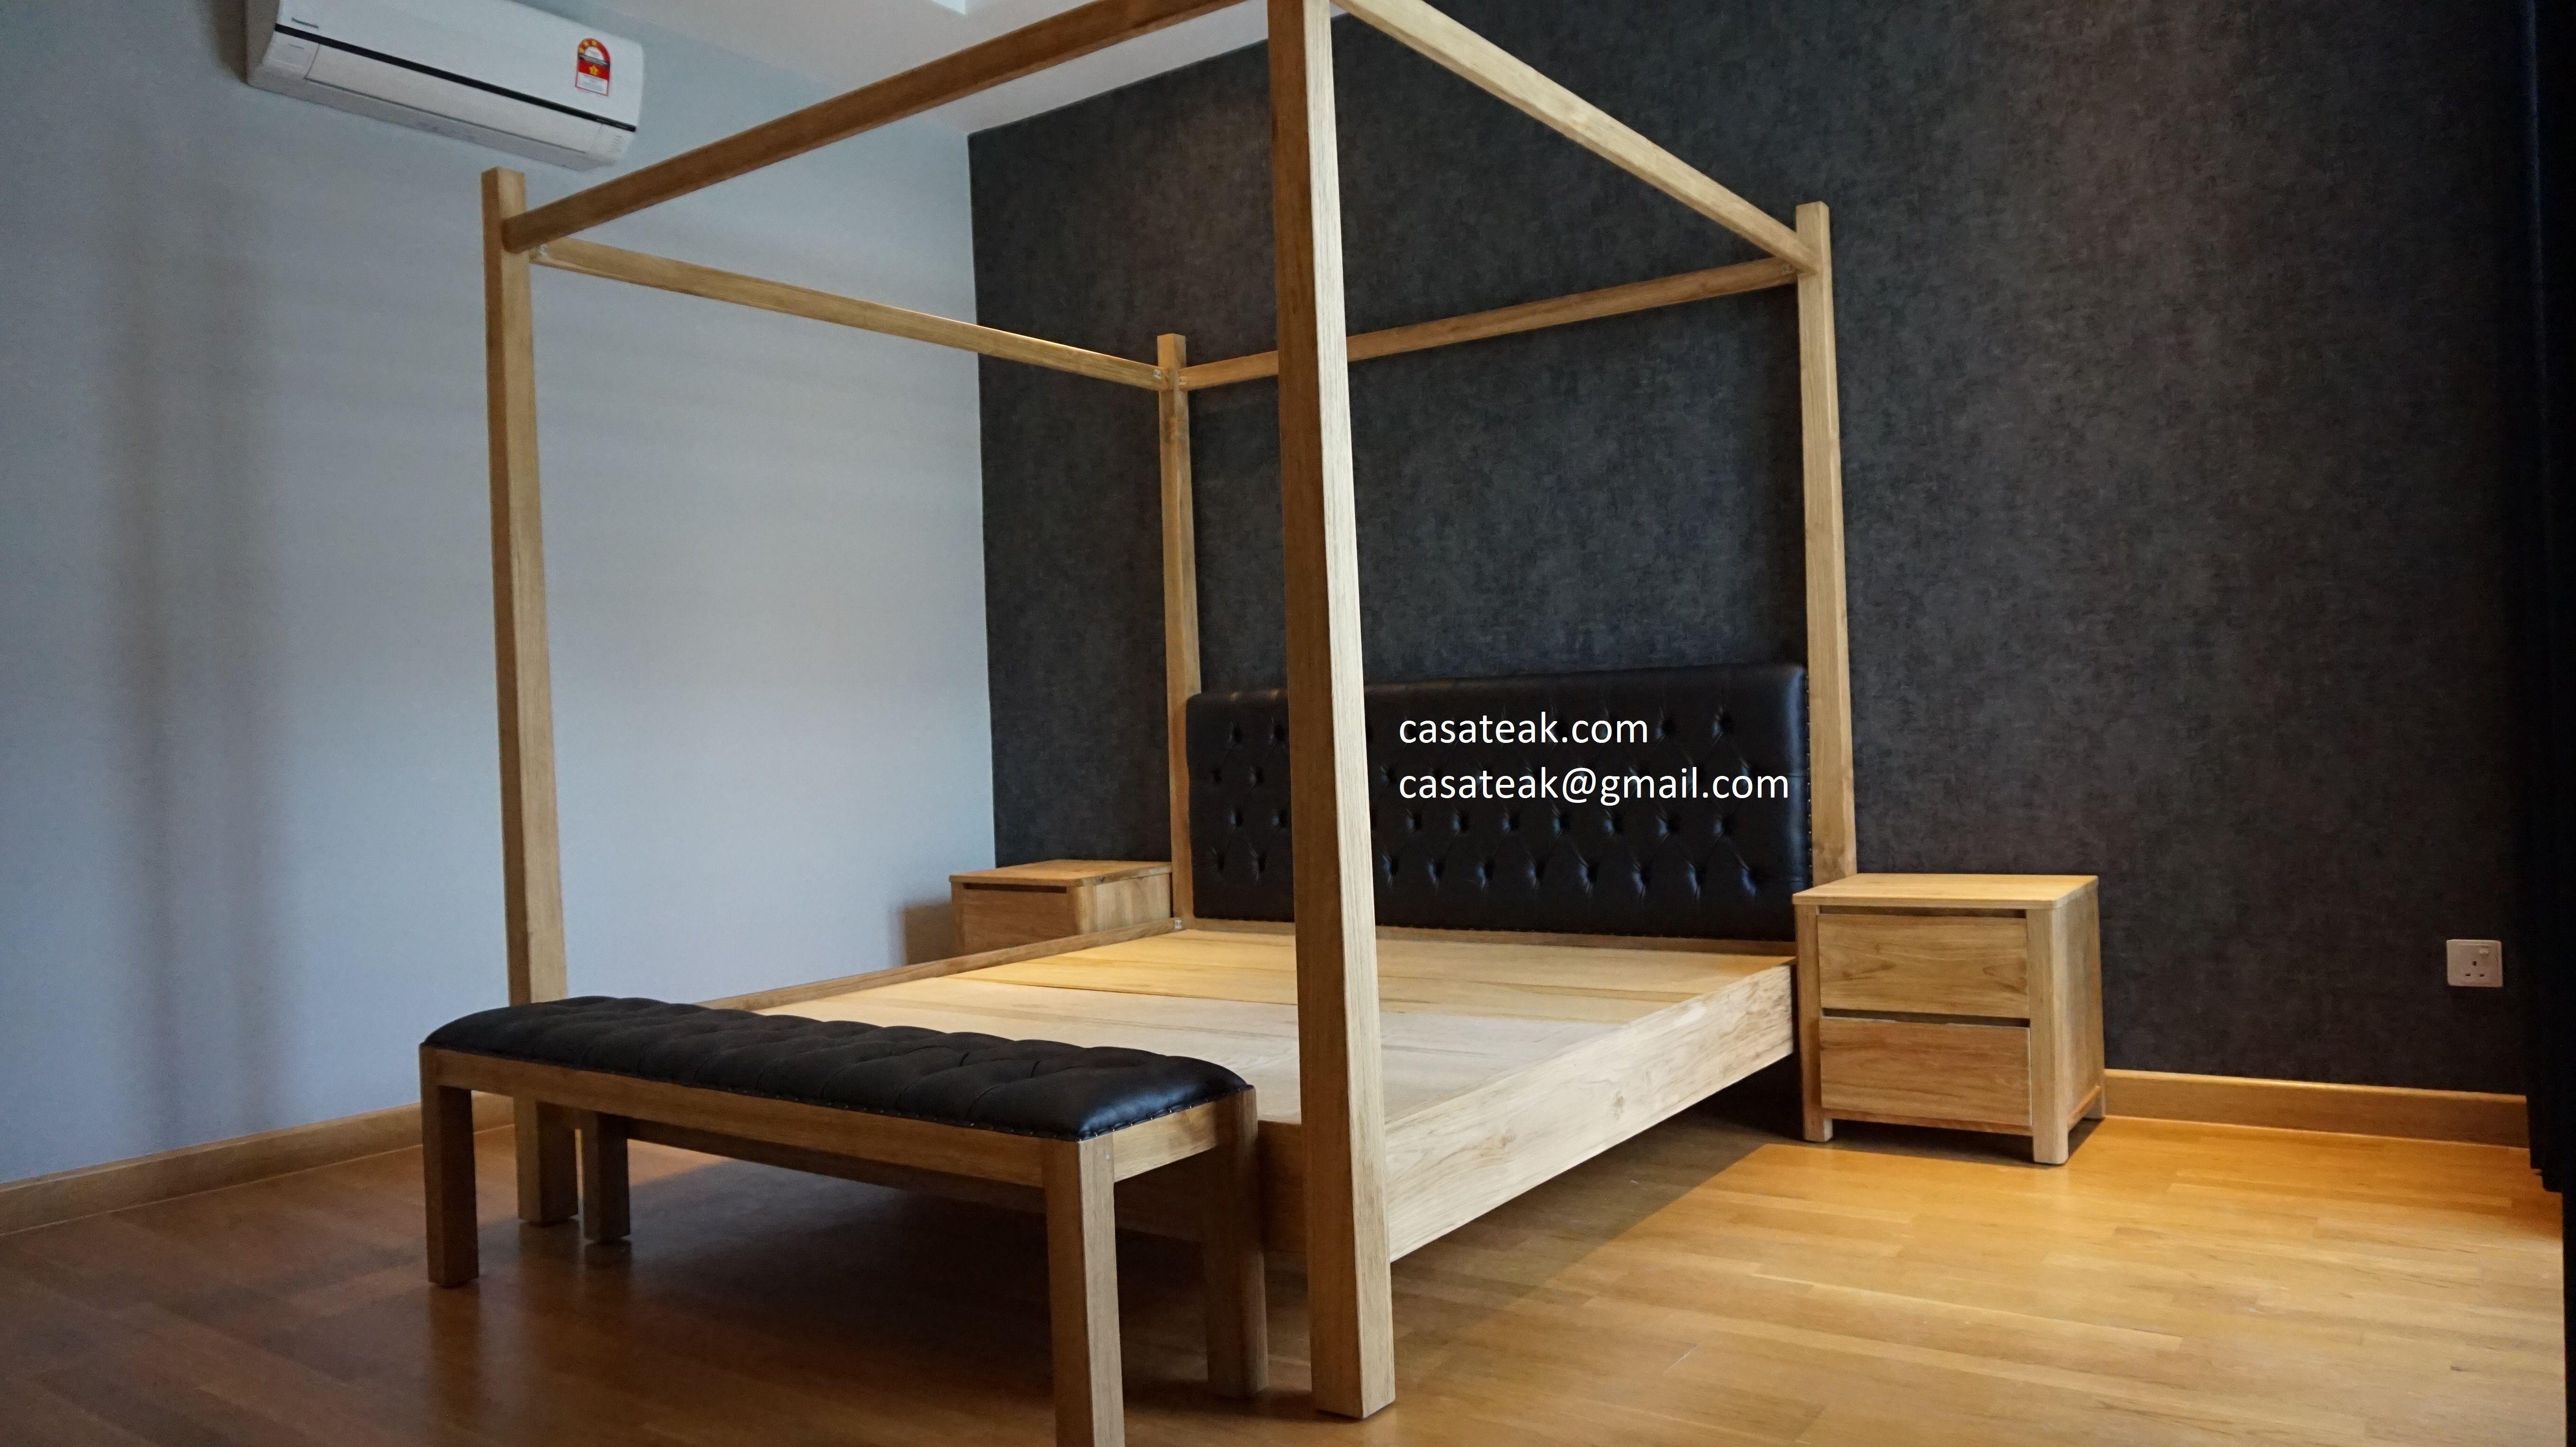 Teak Furniture Malaysia Teak Wood Furniture Shop Selangor Malaysia Furniture Wood Bedroom Furniture Teak Wood Furniture